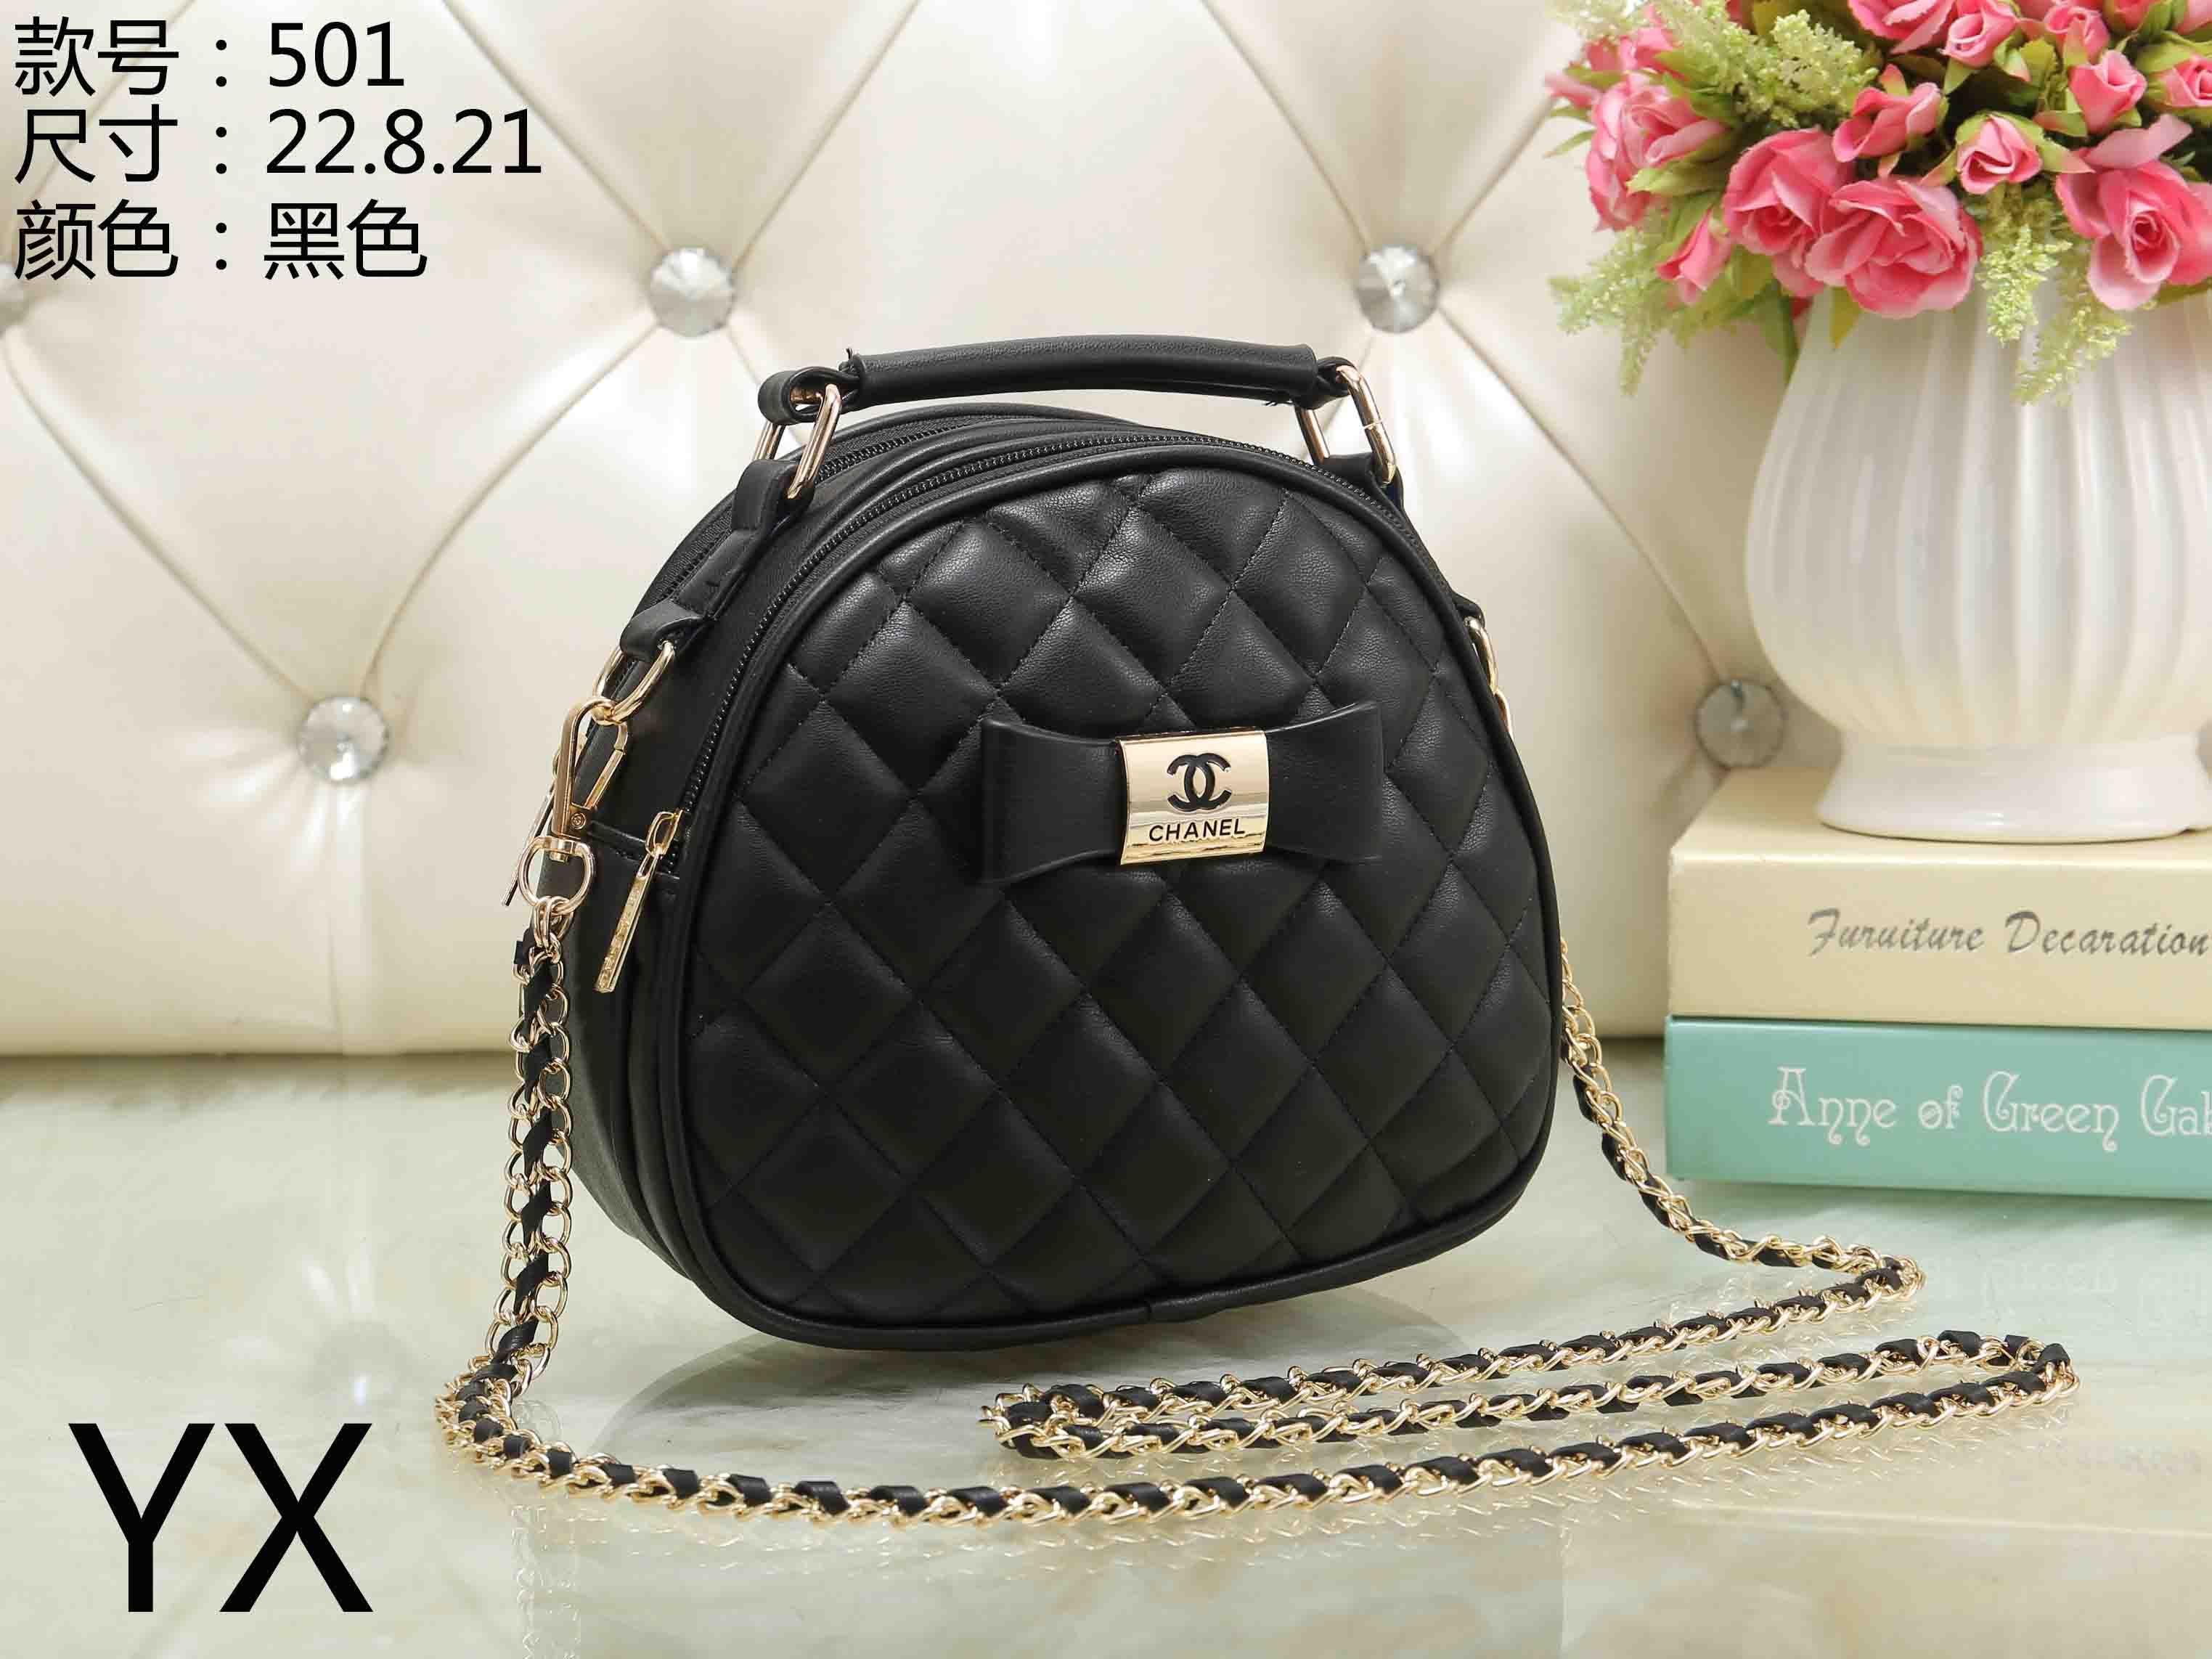 db3acb6c52ad 2018 NEW Styles Fashion Bags Ladies Handbags Designer Bags Women Tote Bag  Luxury Brands Bags Single Shoulder Bag Backpack Wallet Drop Ships Ladies  Handbags ...